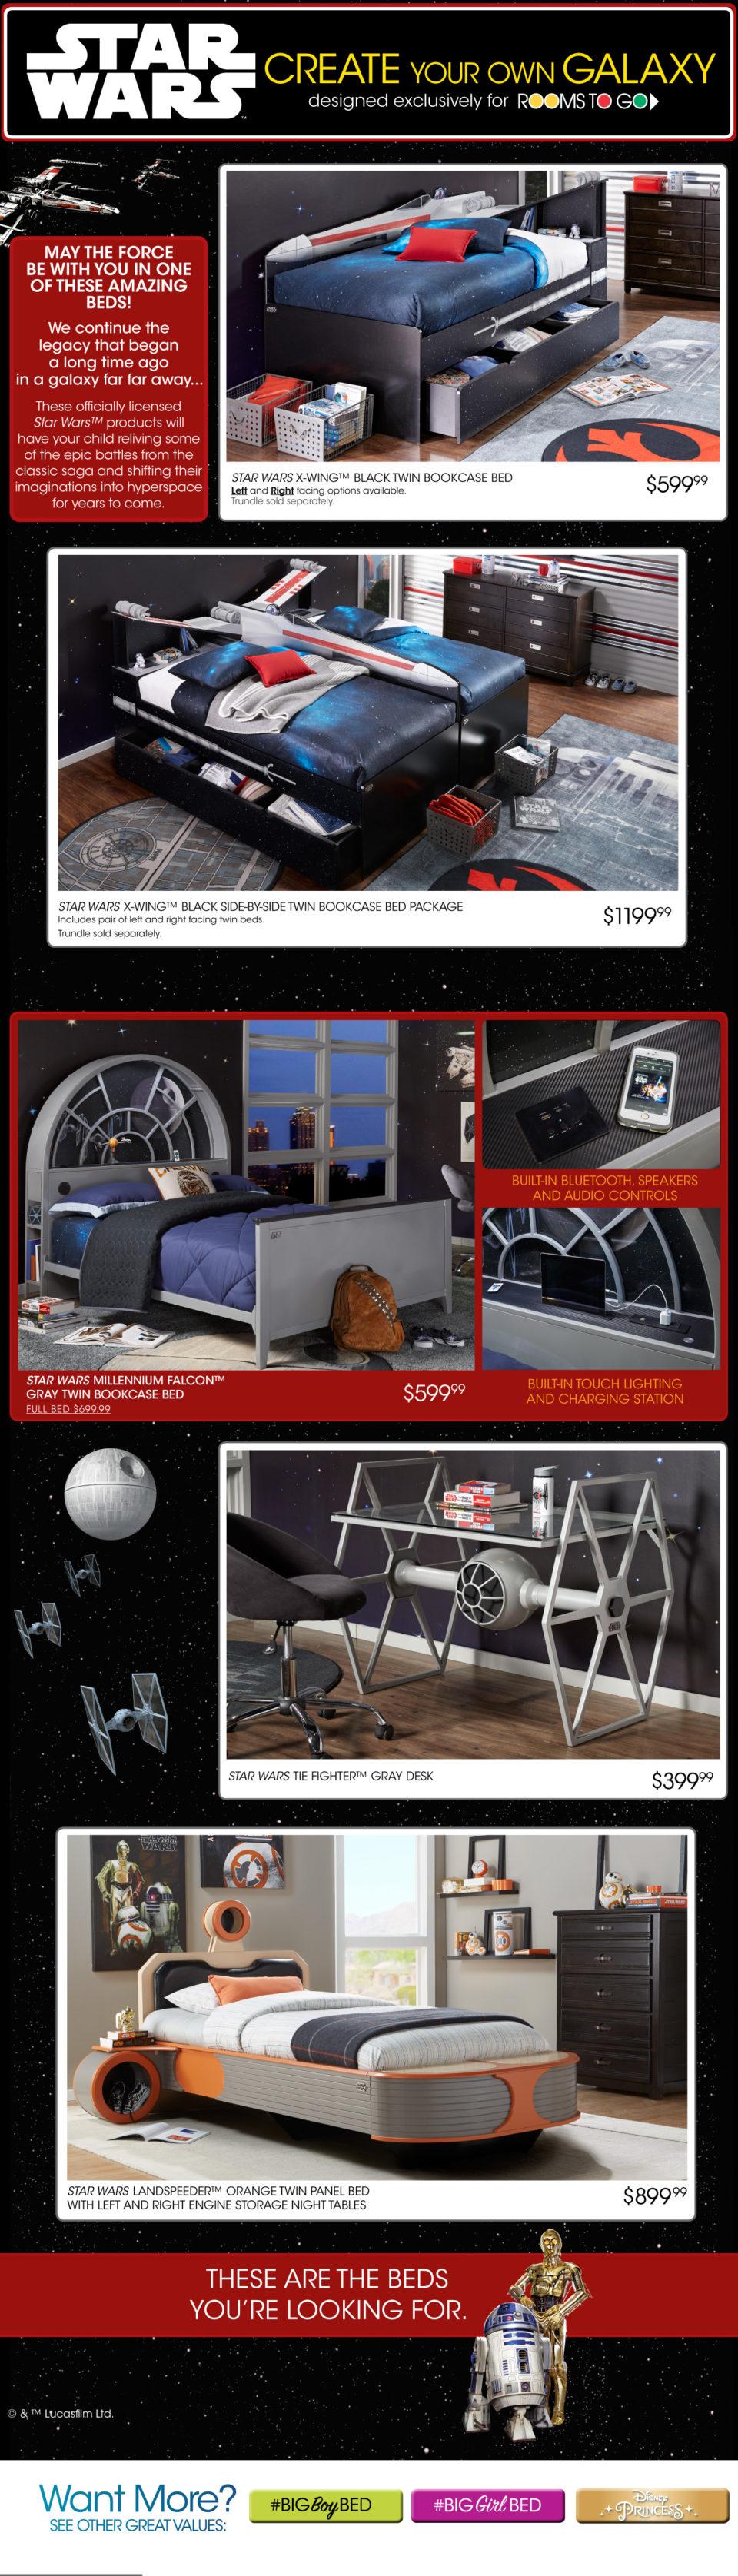 roomstogo_star_wars_furniture_2